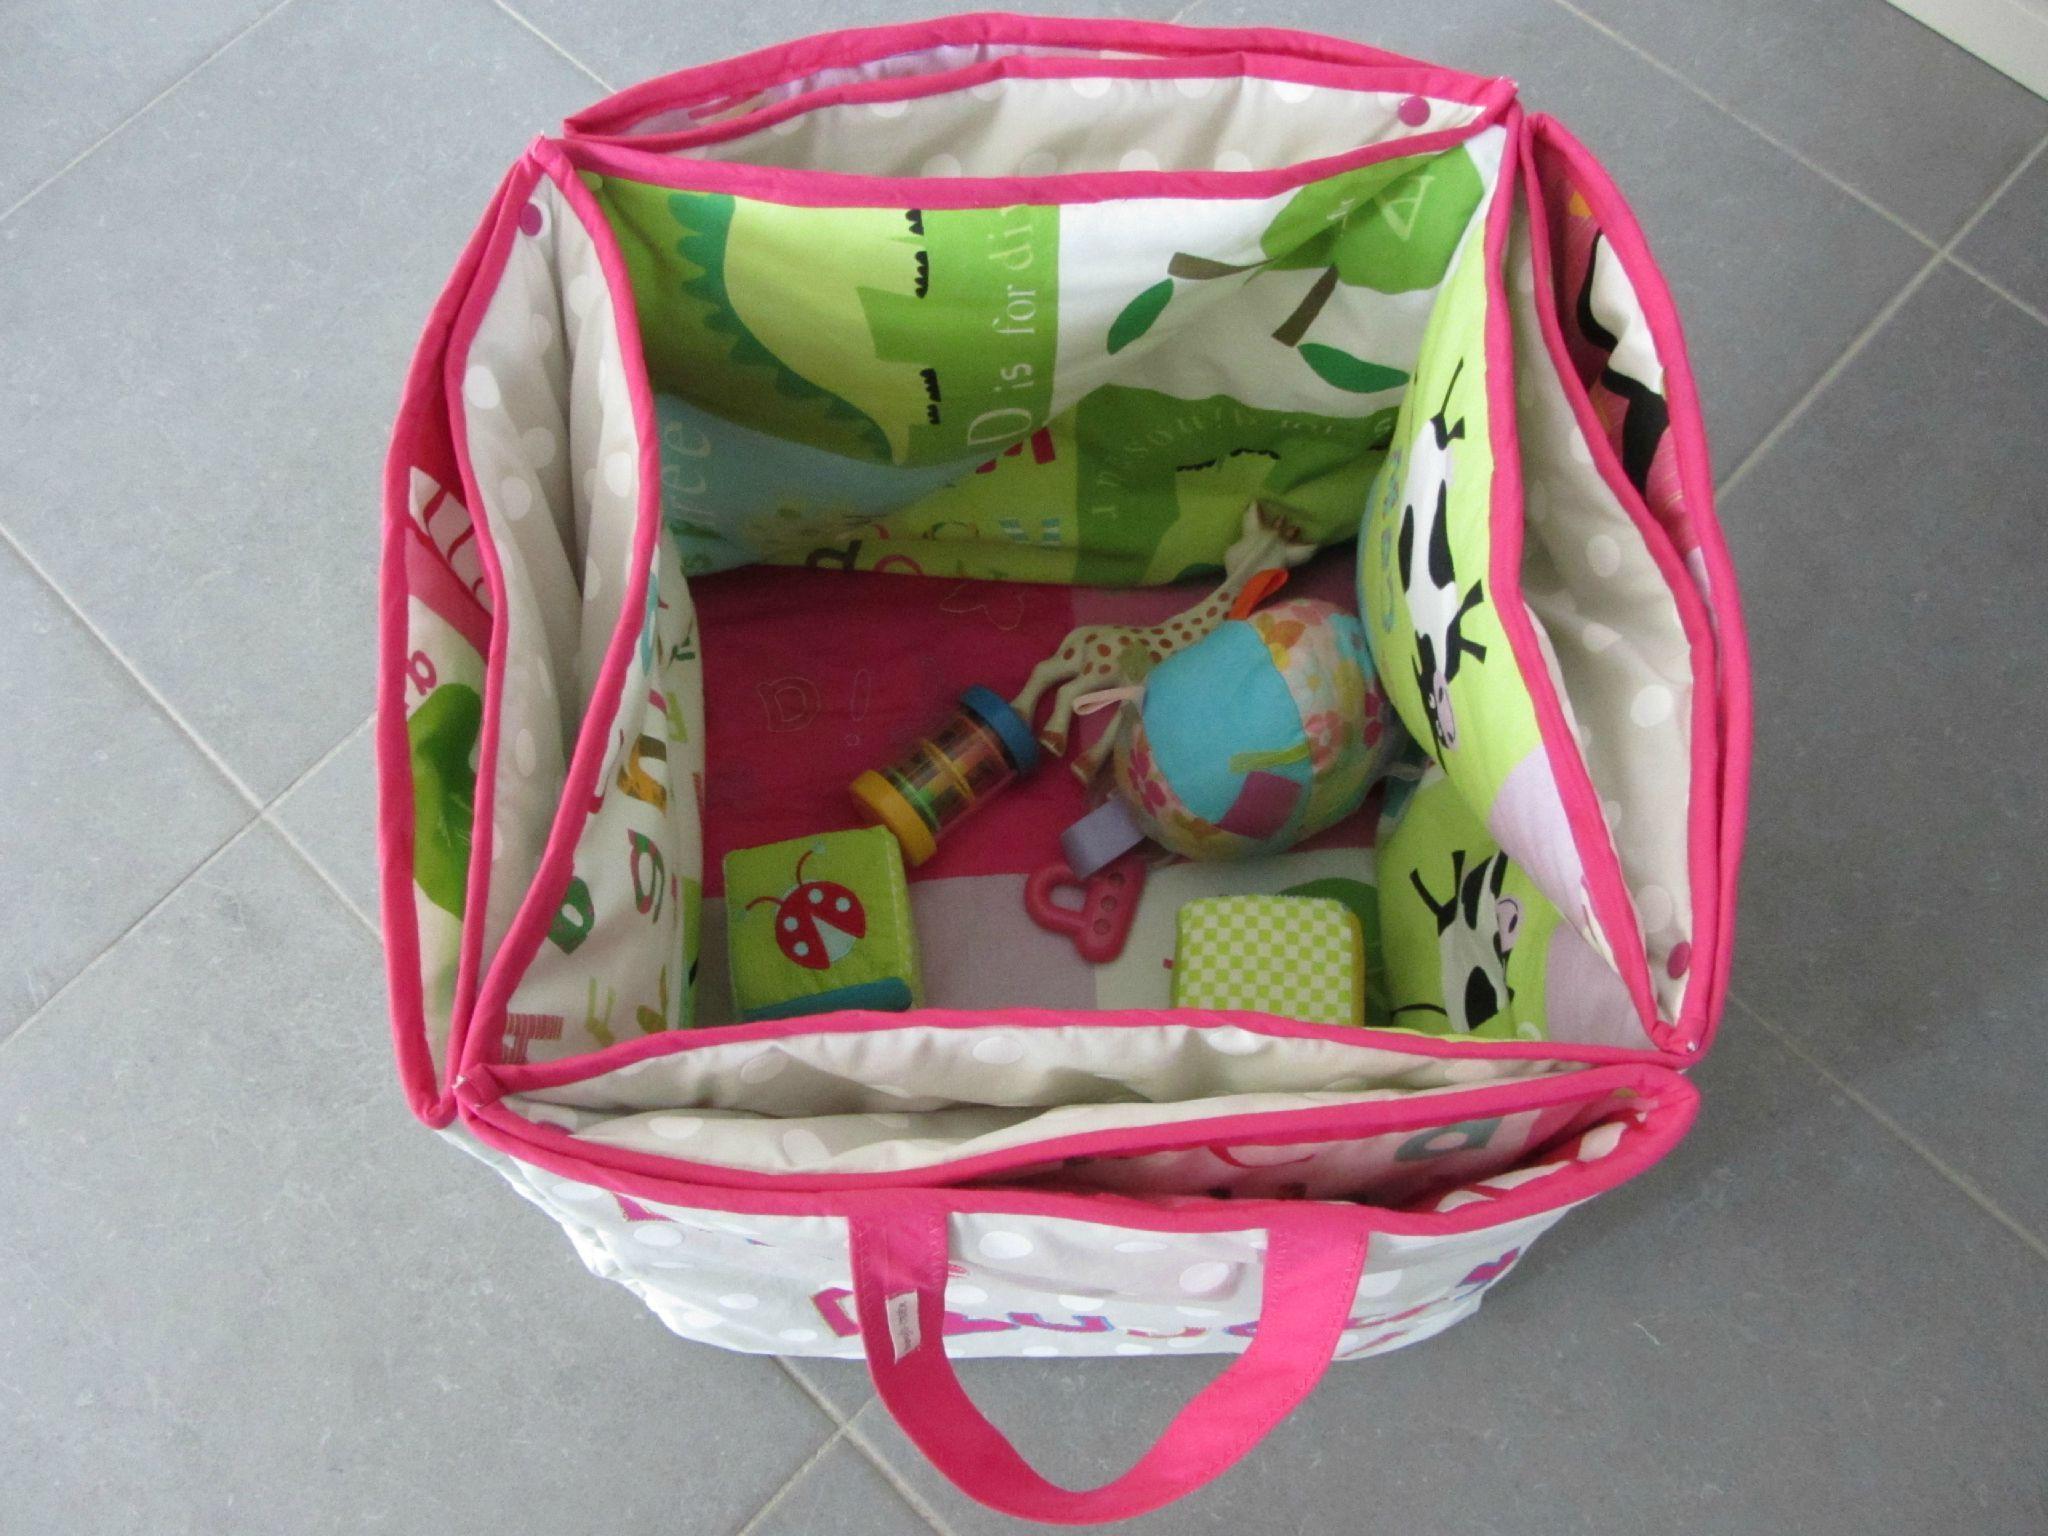 tapis de jeu sac jouets b b baby pinterest. Black Bedroom Furniture Sets. Home Design Ideas